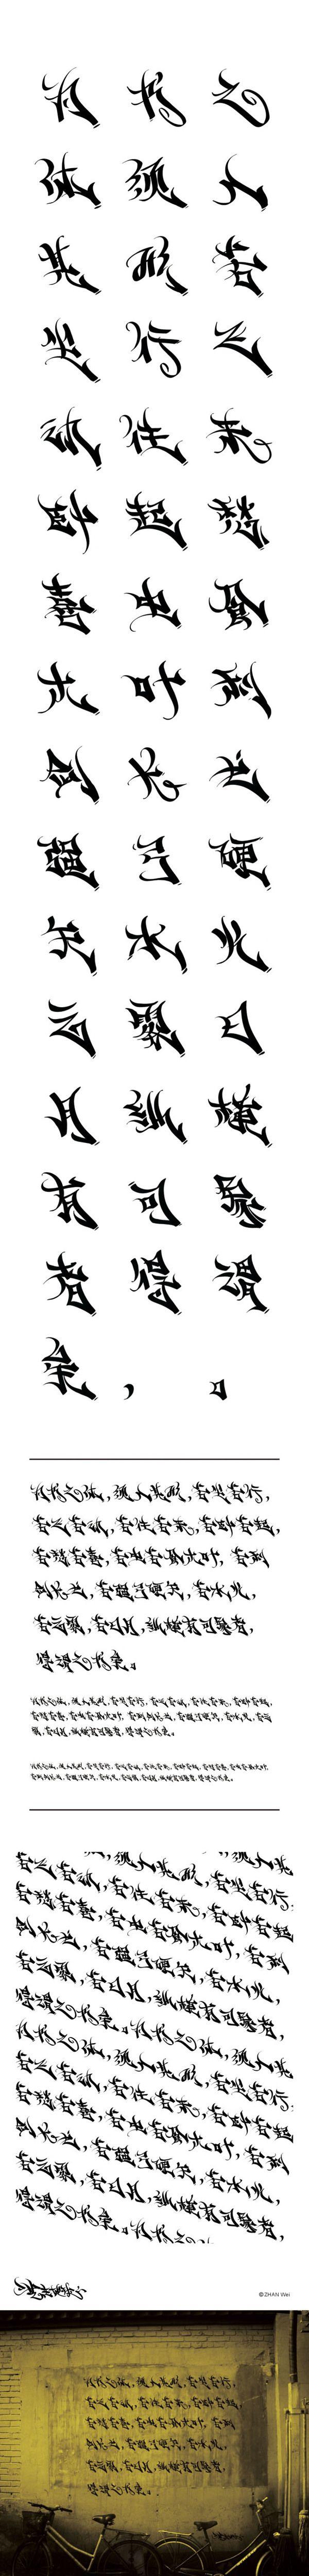 GraffitiC_001 街書  以涂滿全球的街頭書寫風格爲創想點。結體移型變位,疏張個性,特立獨行,搖擺的動力學和勁道的筆觸來構建,展現出漢字煥發活力、舞動的一面。適宜新世代異媒體的應用。